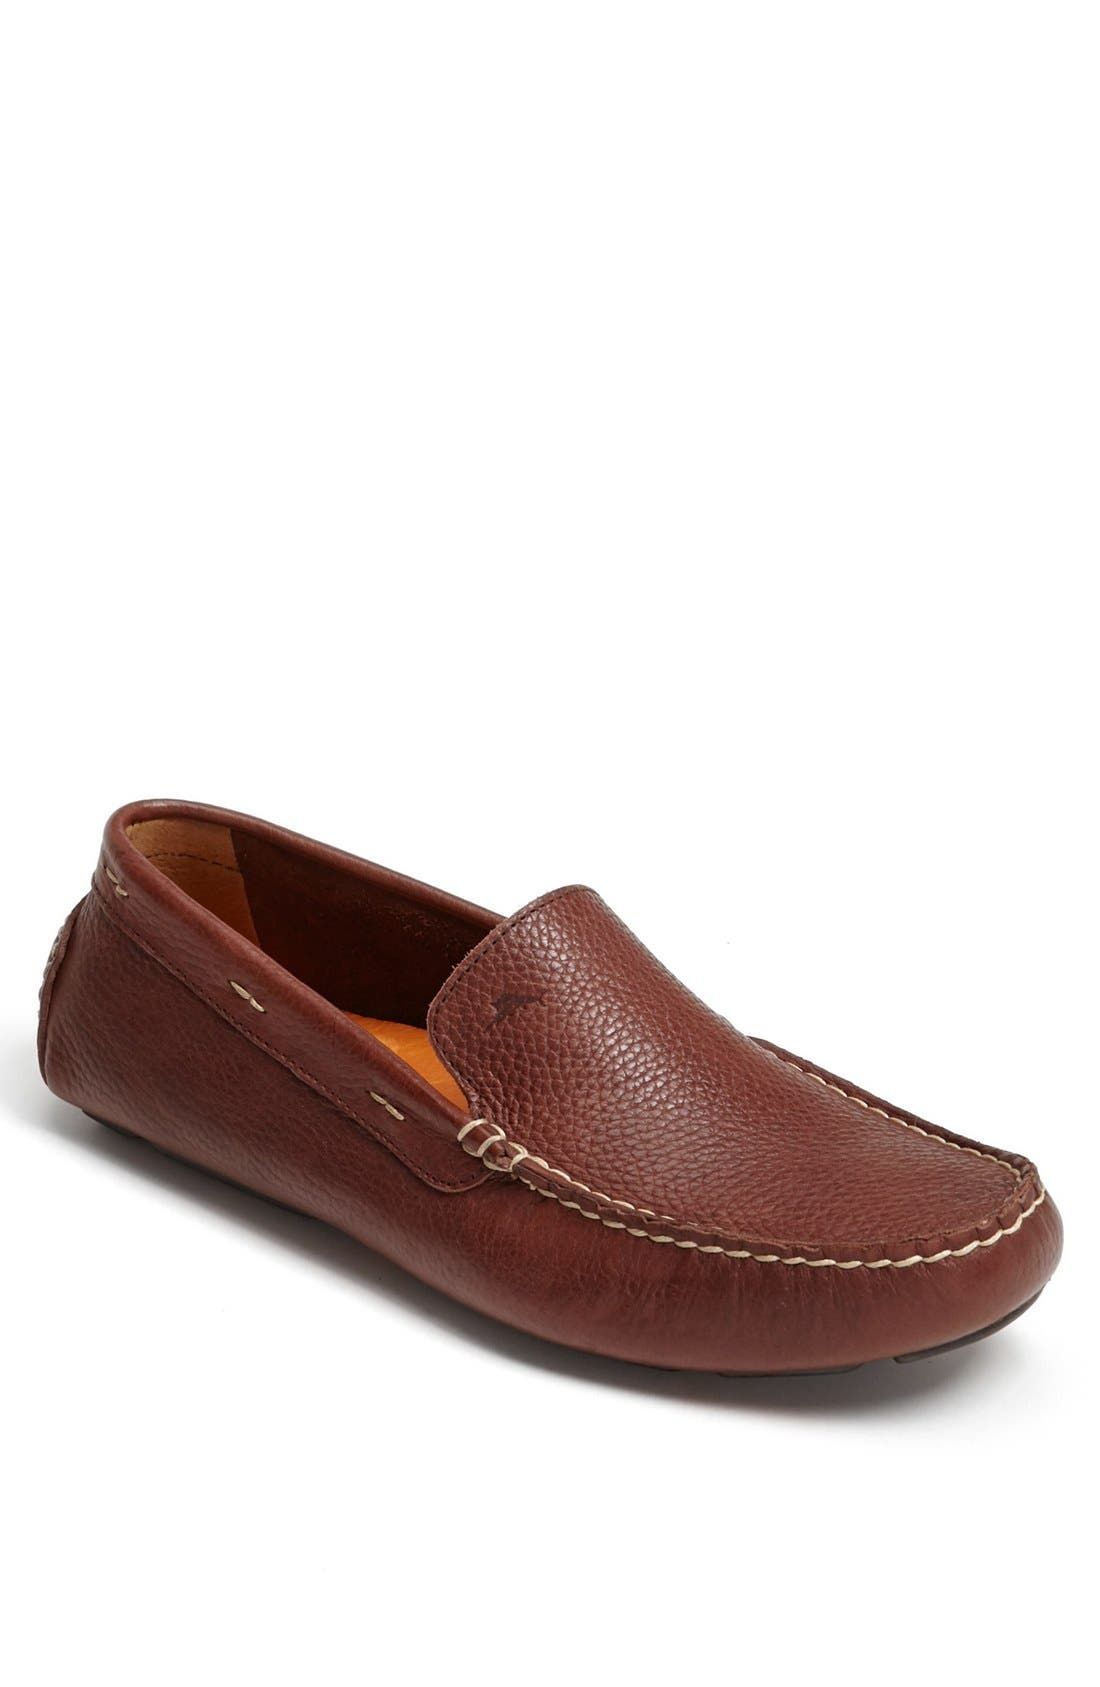 Main Image - Tommy Bahama 'Pagota' Driving Shoe